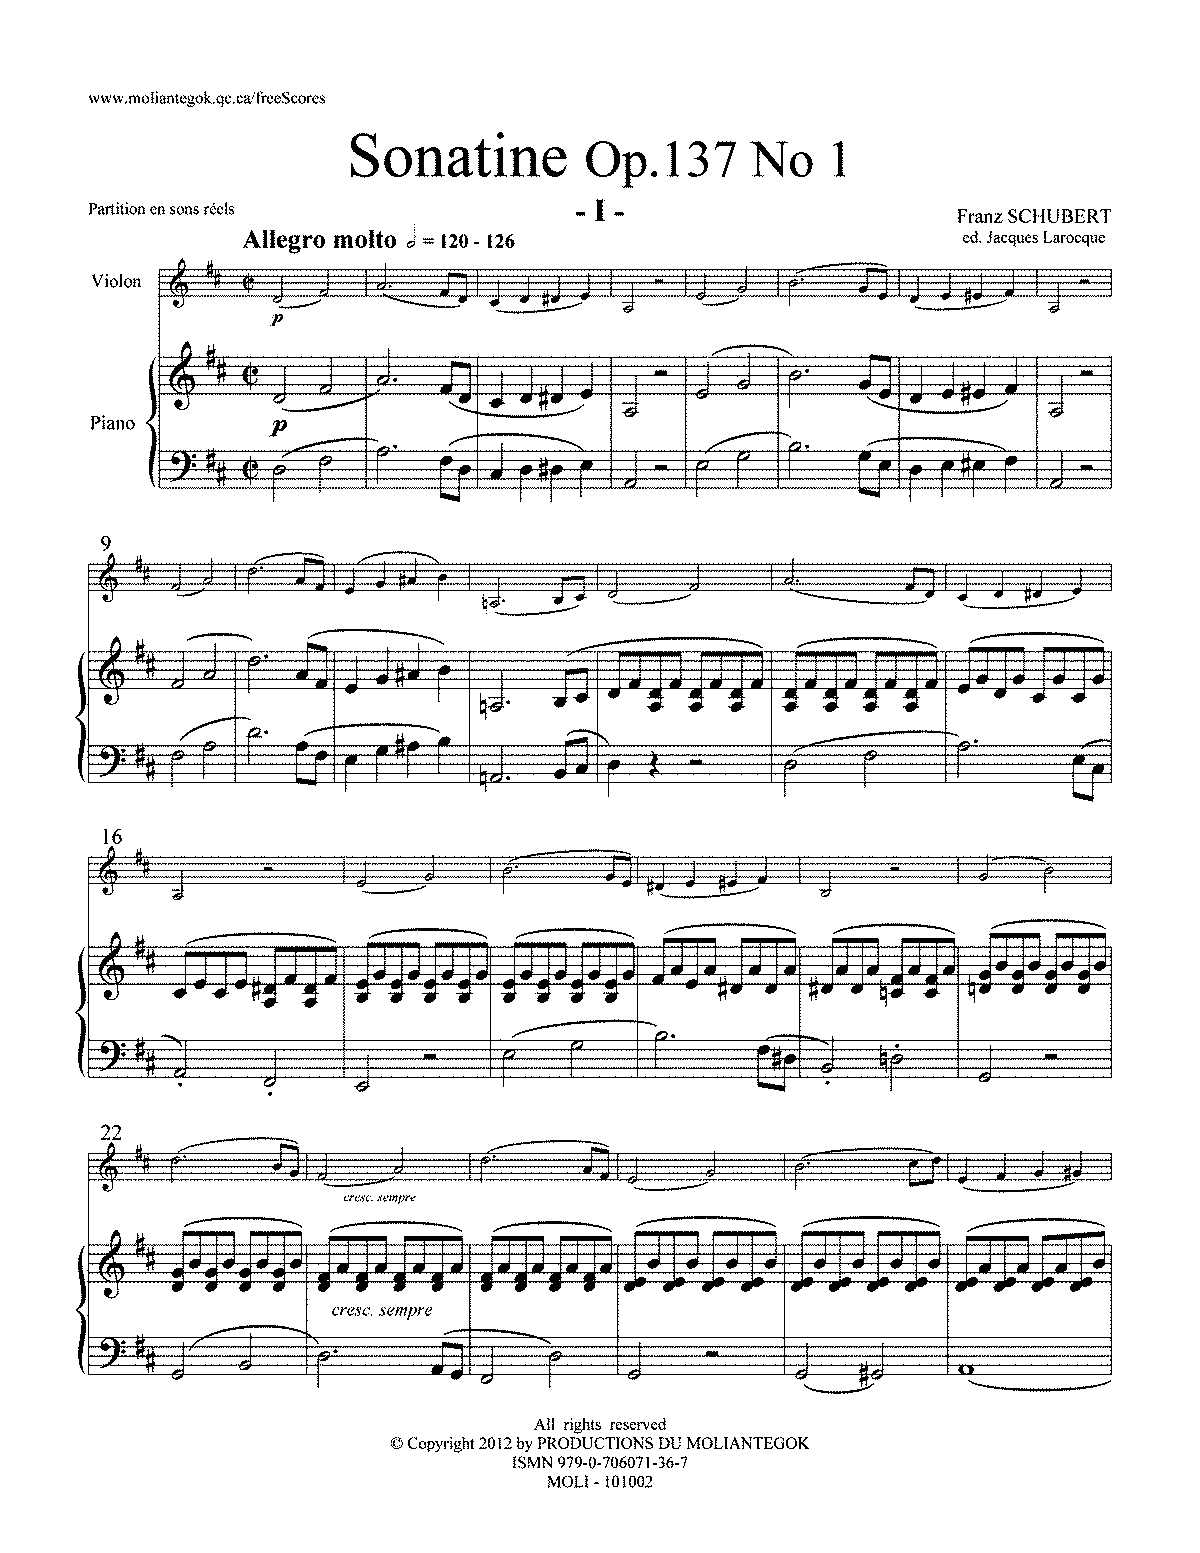 Schubert: Sonates pour pianoforte & violon